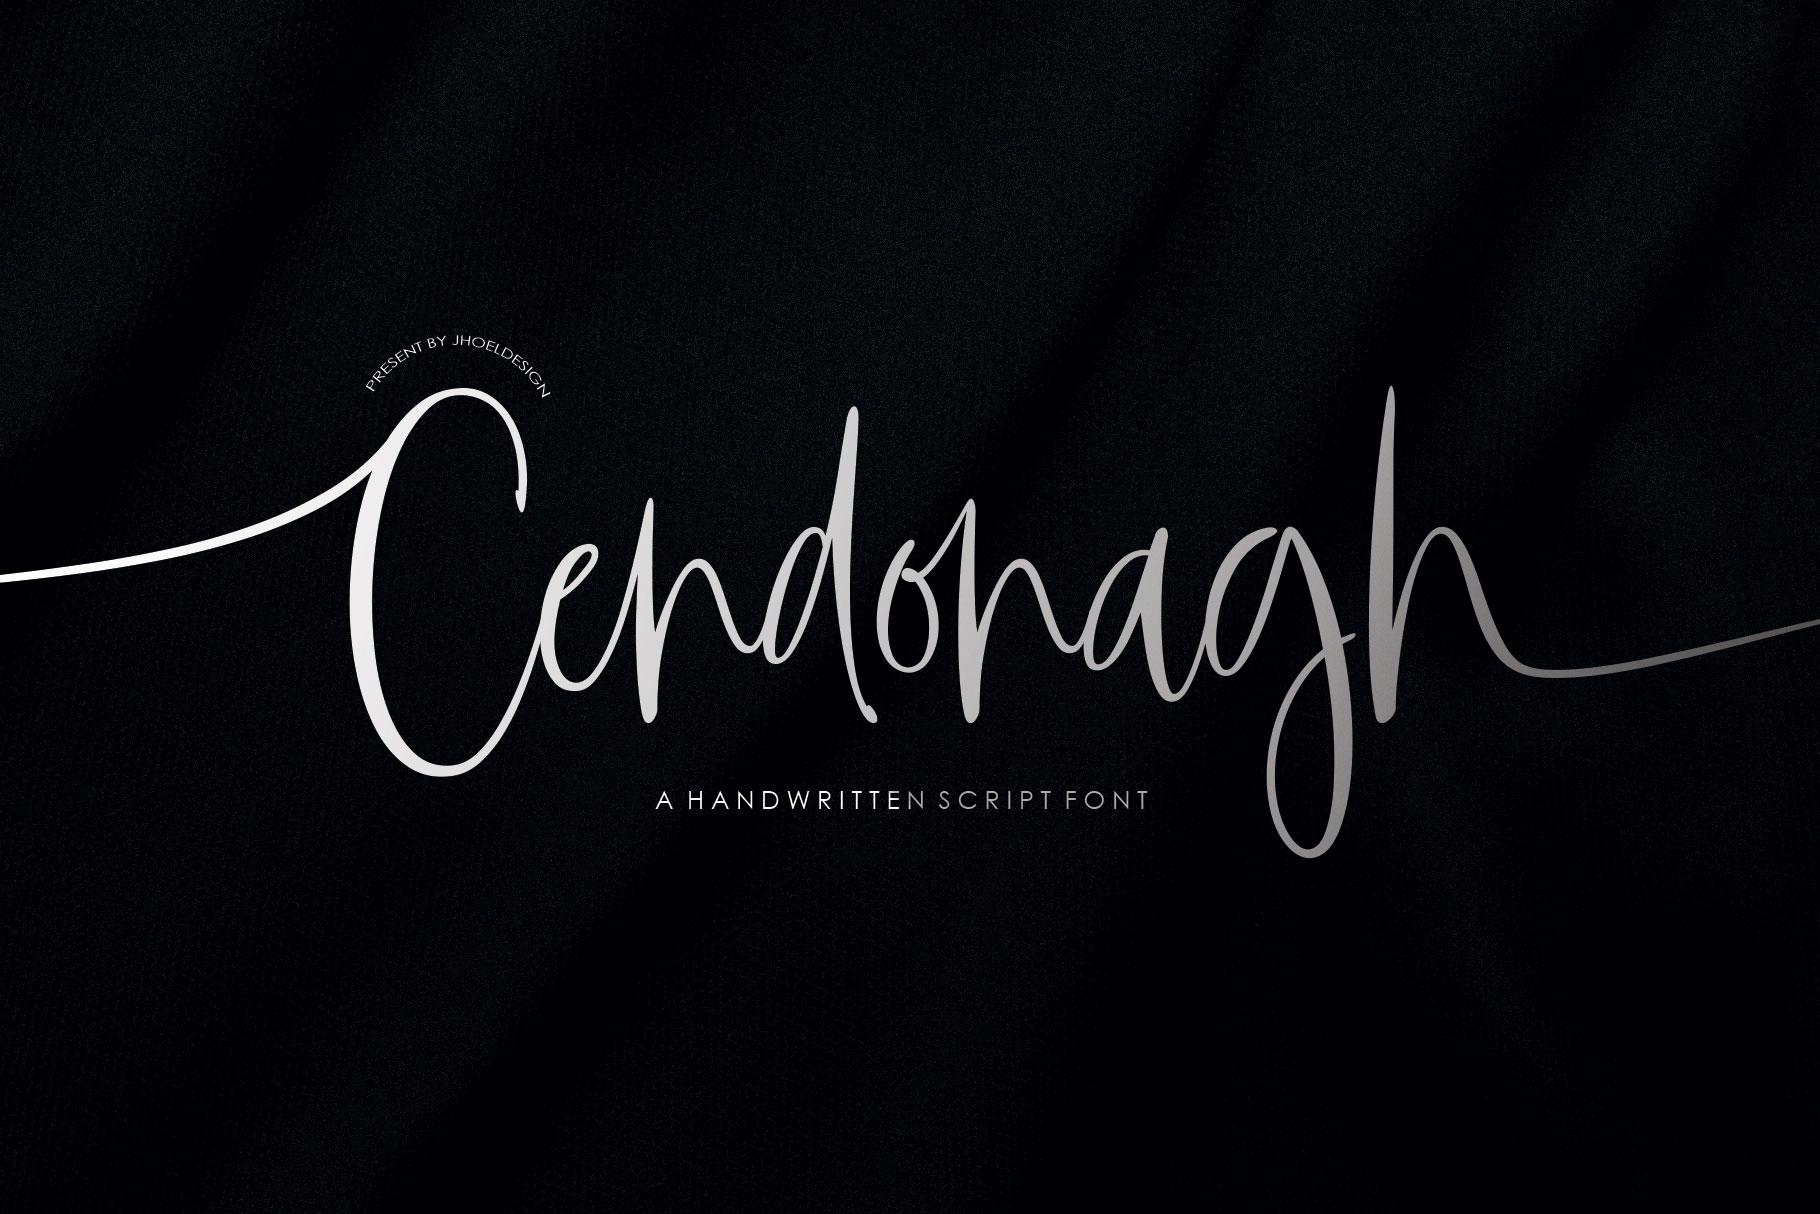 Cendonagh example image 15